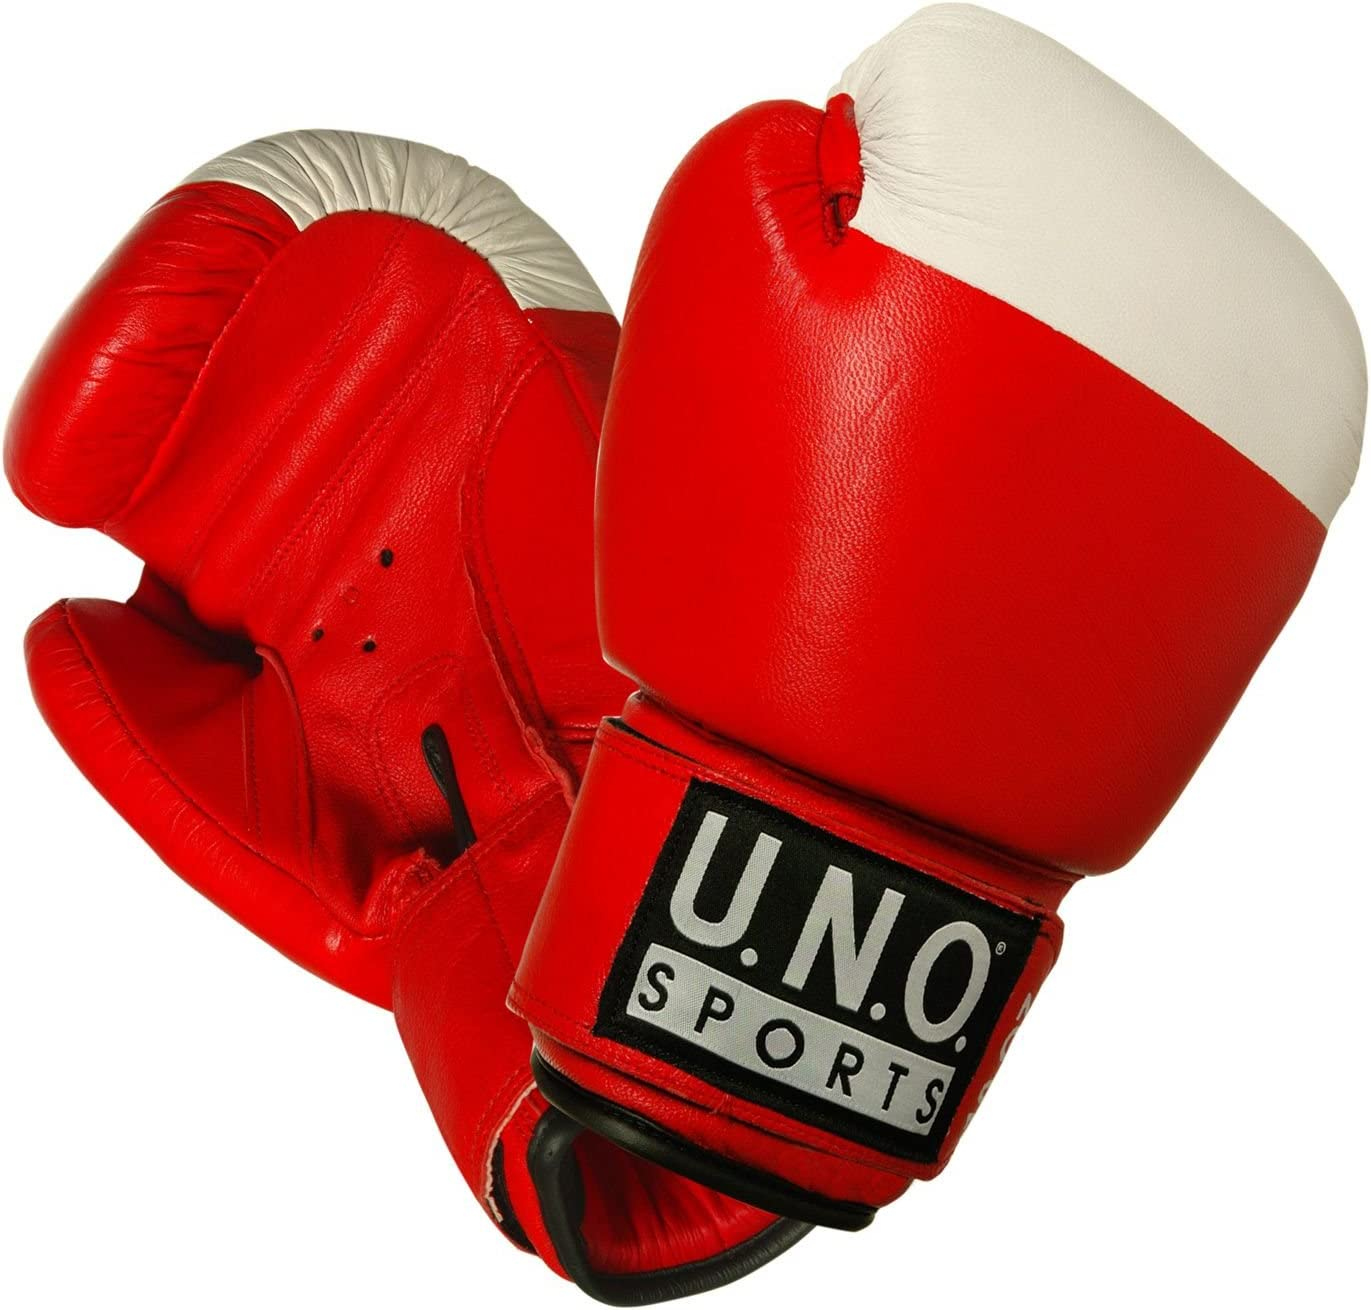 Sports Herren Boxhandschuh Competition U.N.O